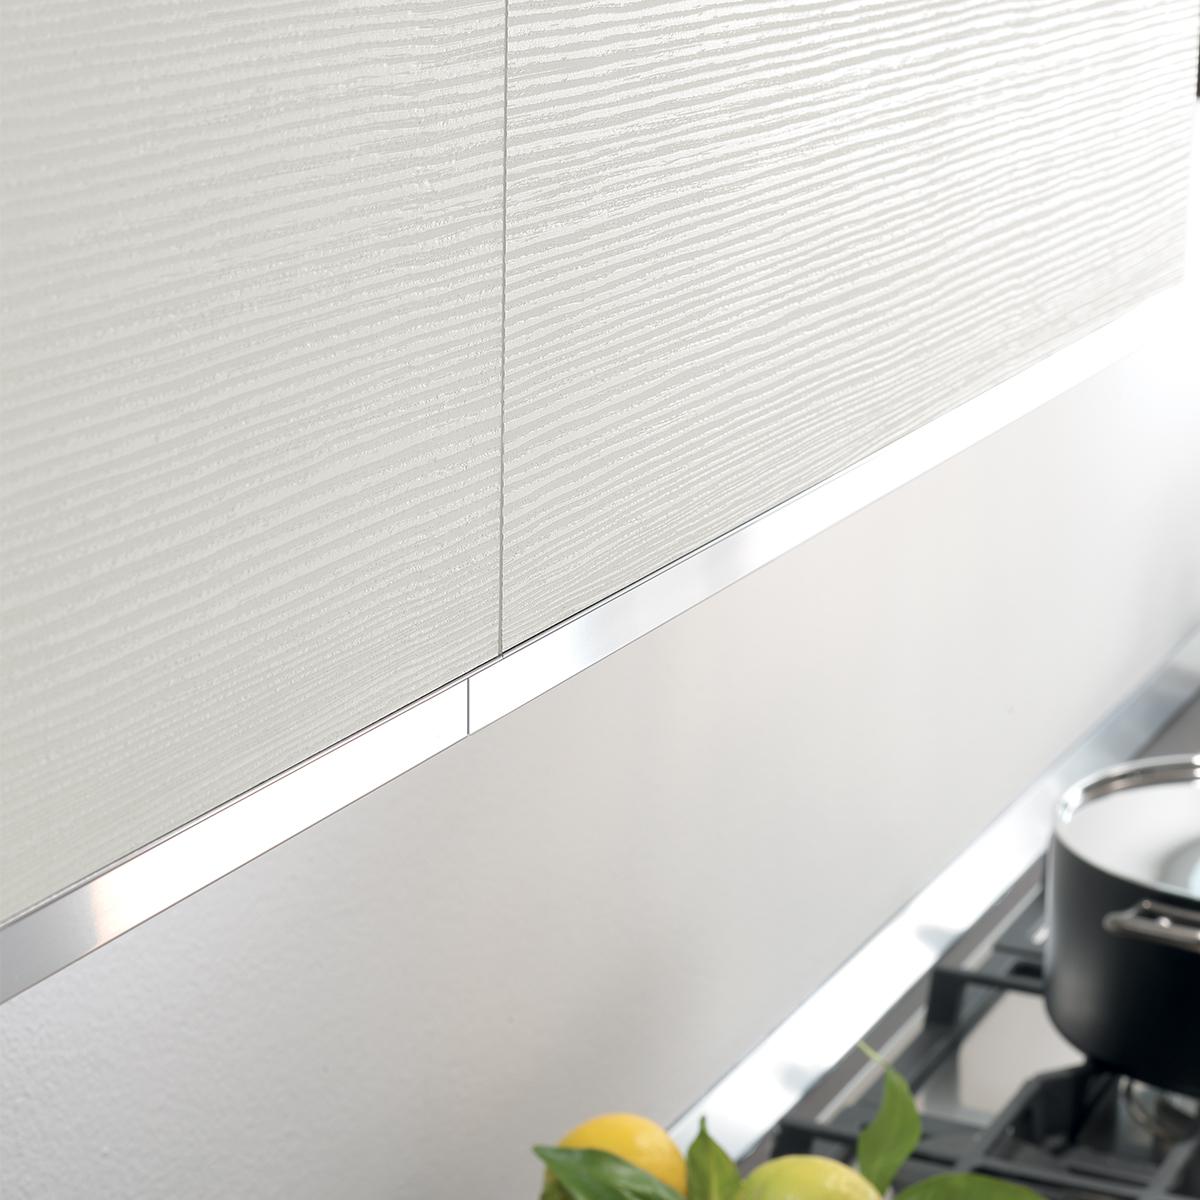 Cucina componibile, effetto bianco | : Oasi Q4U4